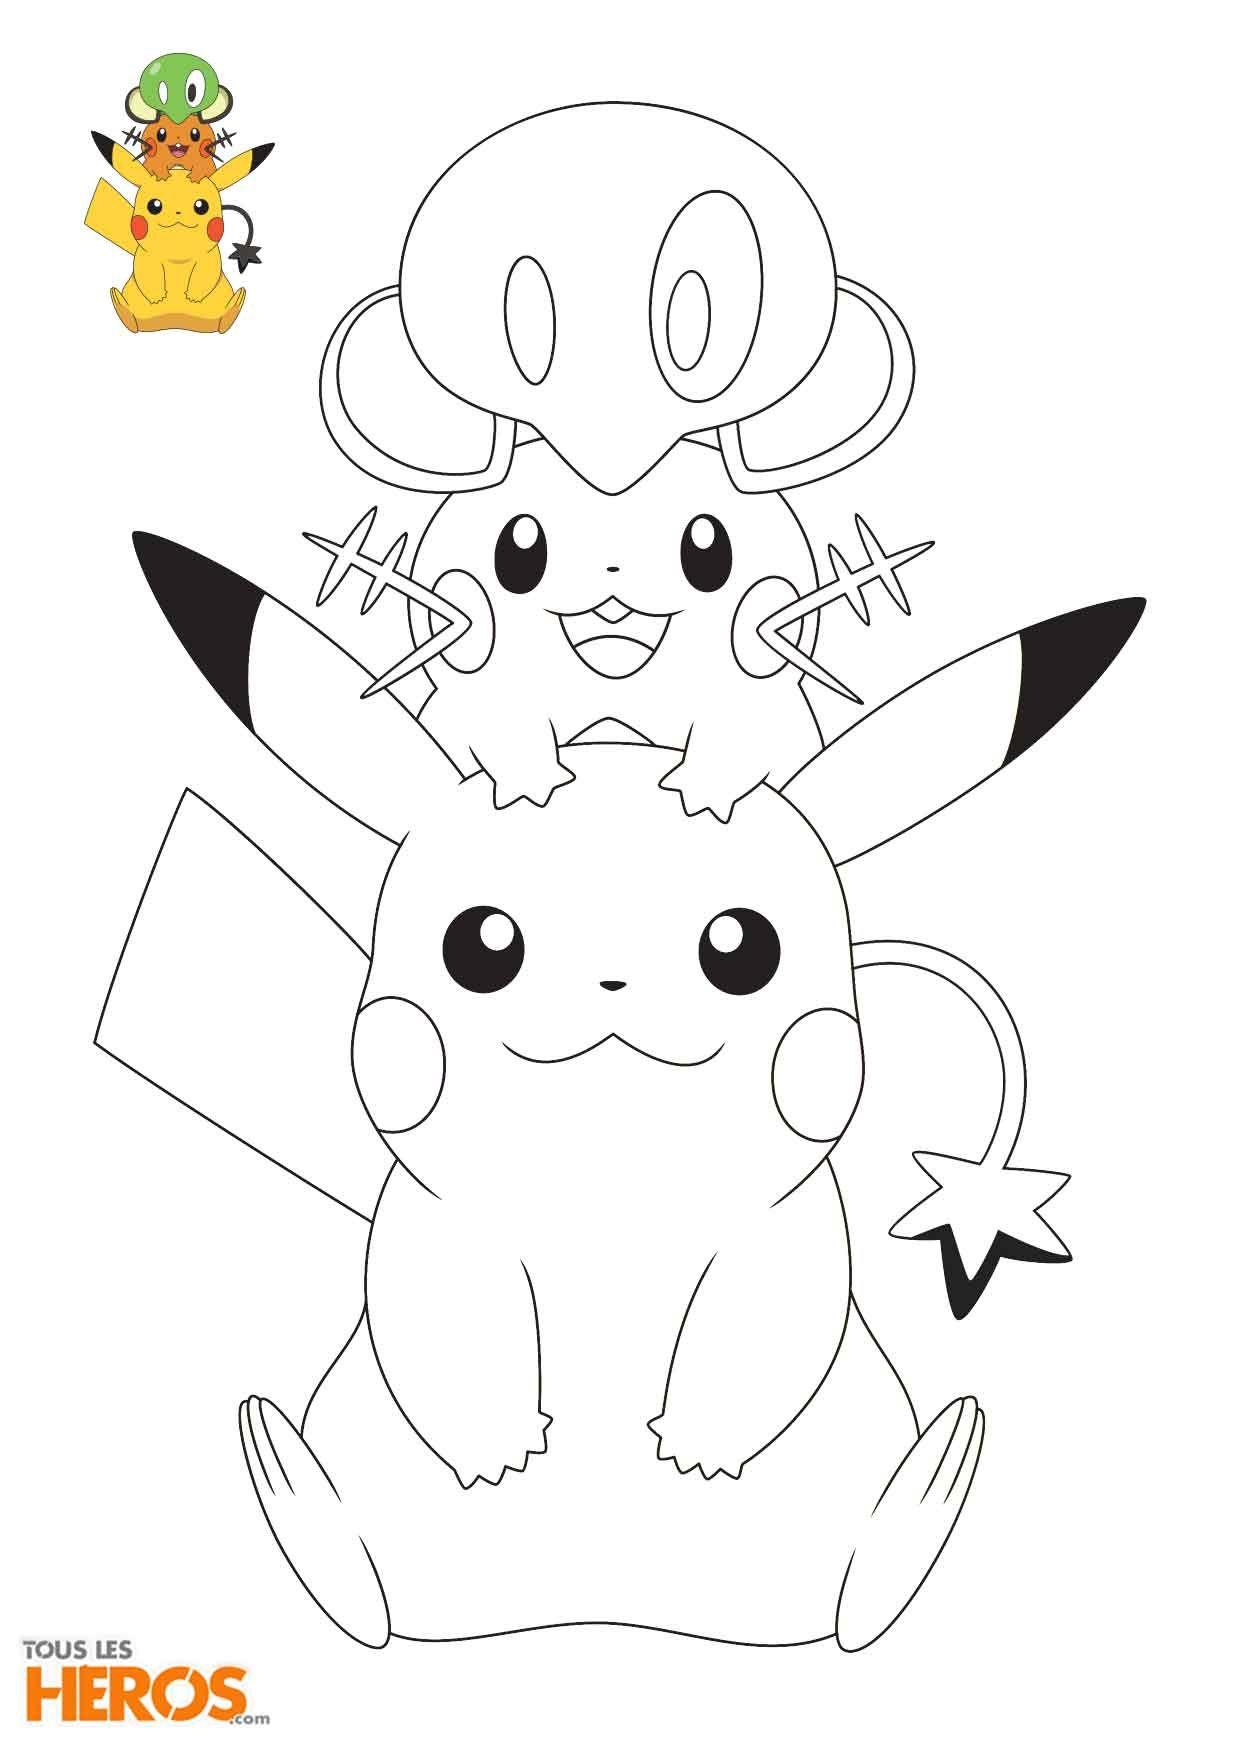 Inspirant Coloriage Pokemon Evolution Evoli Imprimer avec Coloriage De Pokemon A Imprimer Gratuitement